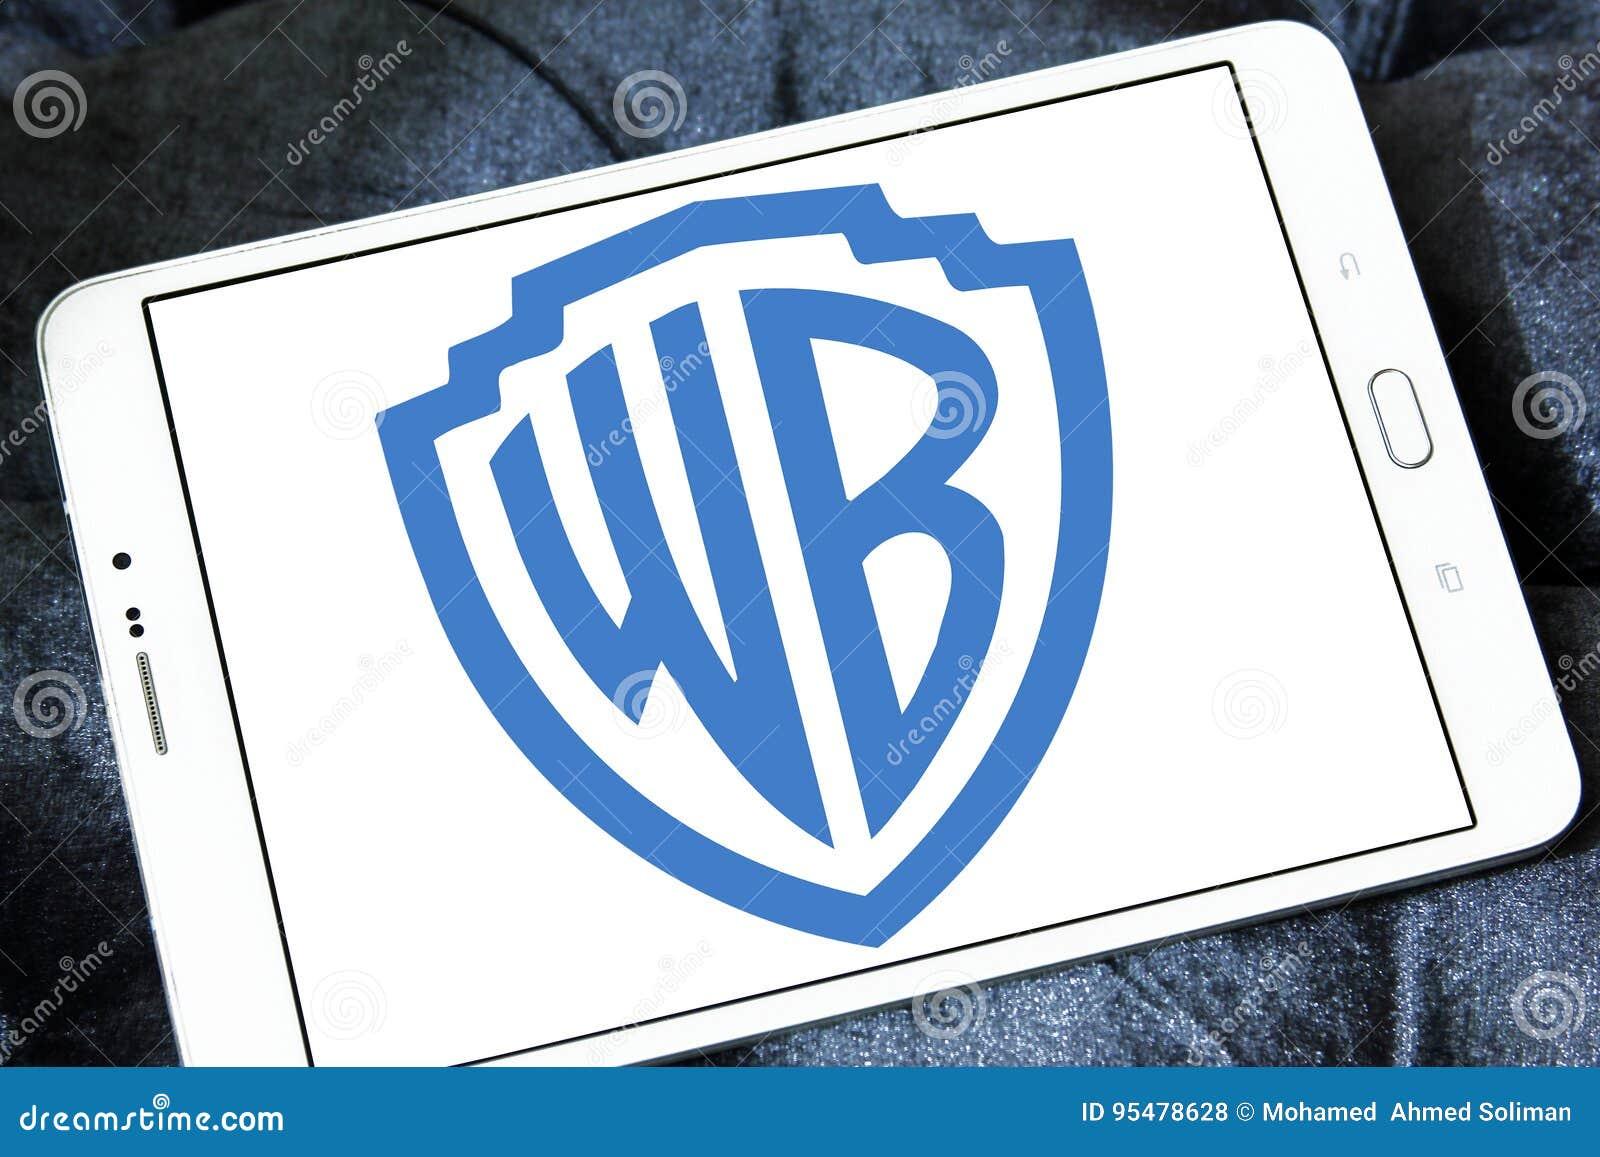 Wb, Warner braci logo